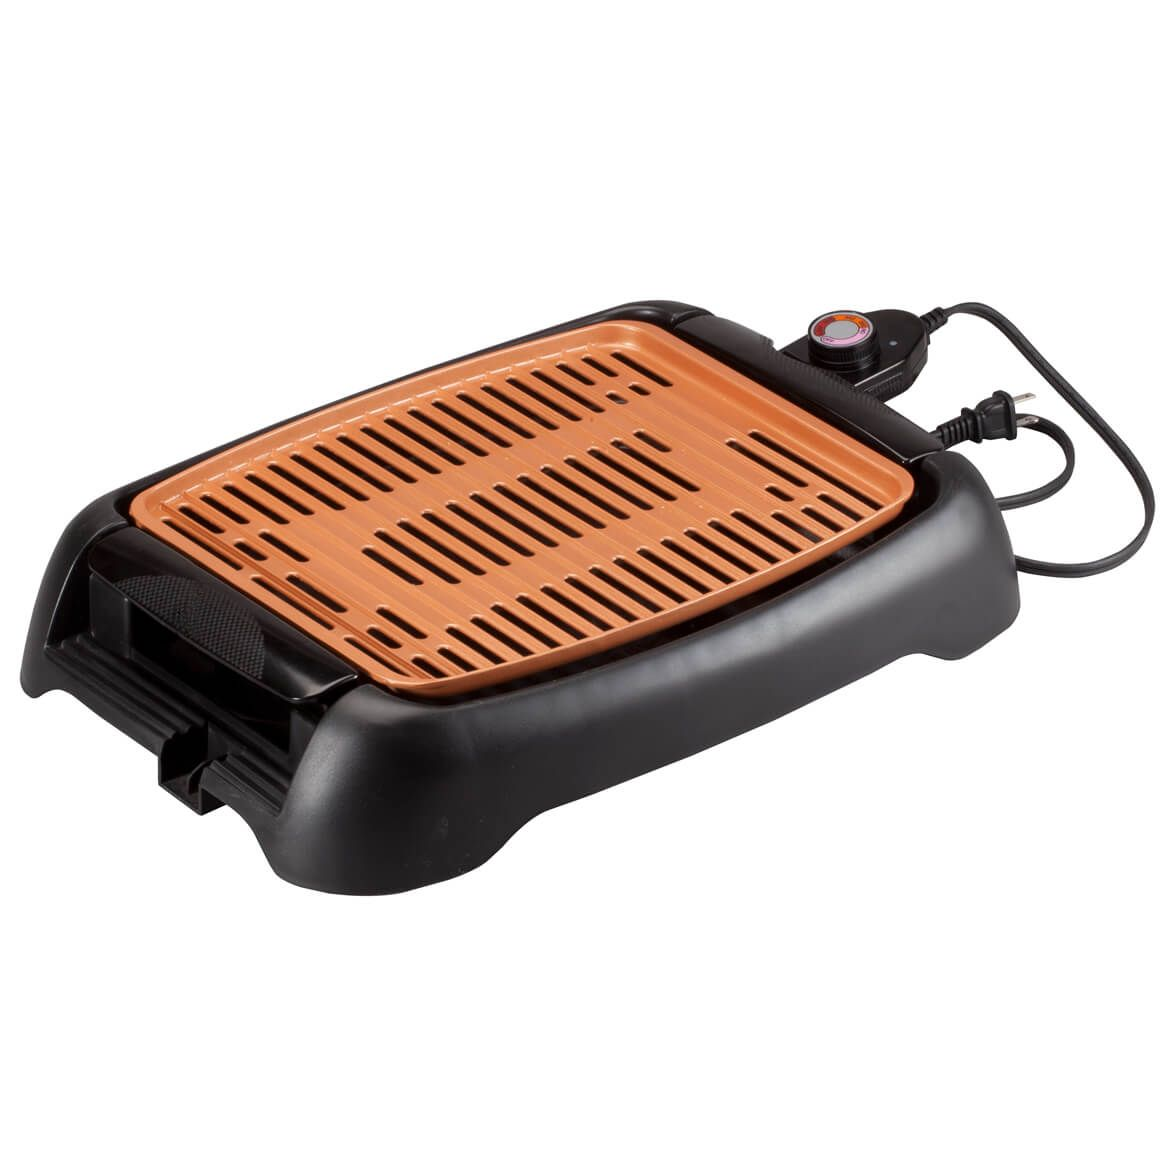 "NonStick Ceramic Copper 13"" Countertop Electric Grill by HMP-360725"